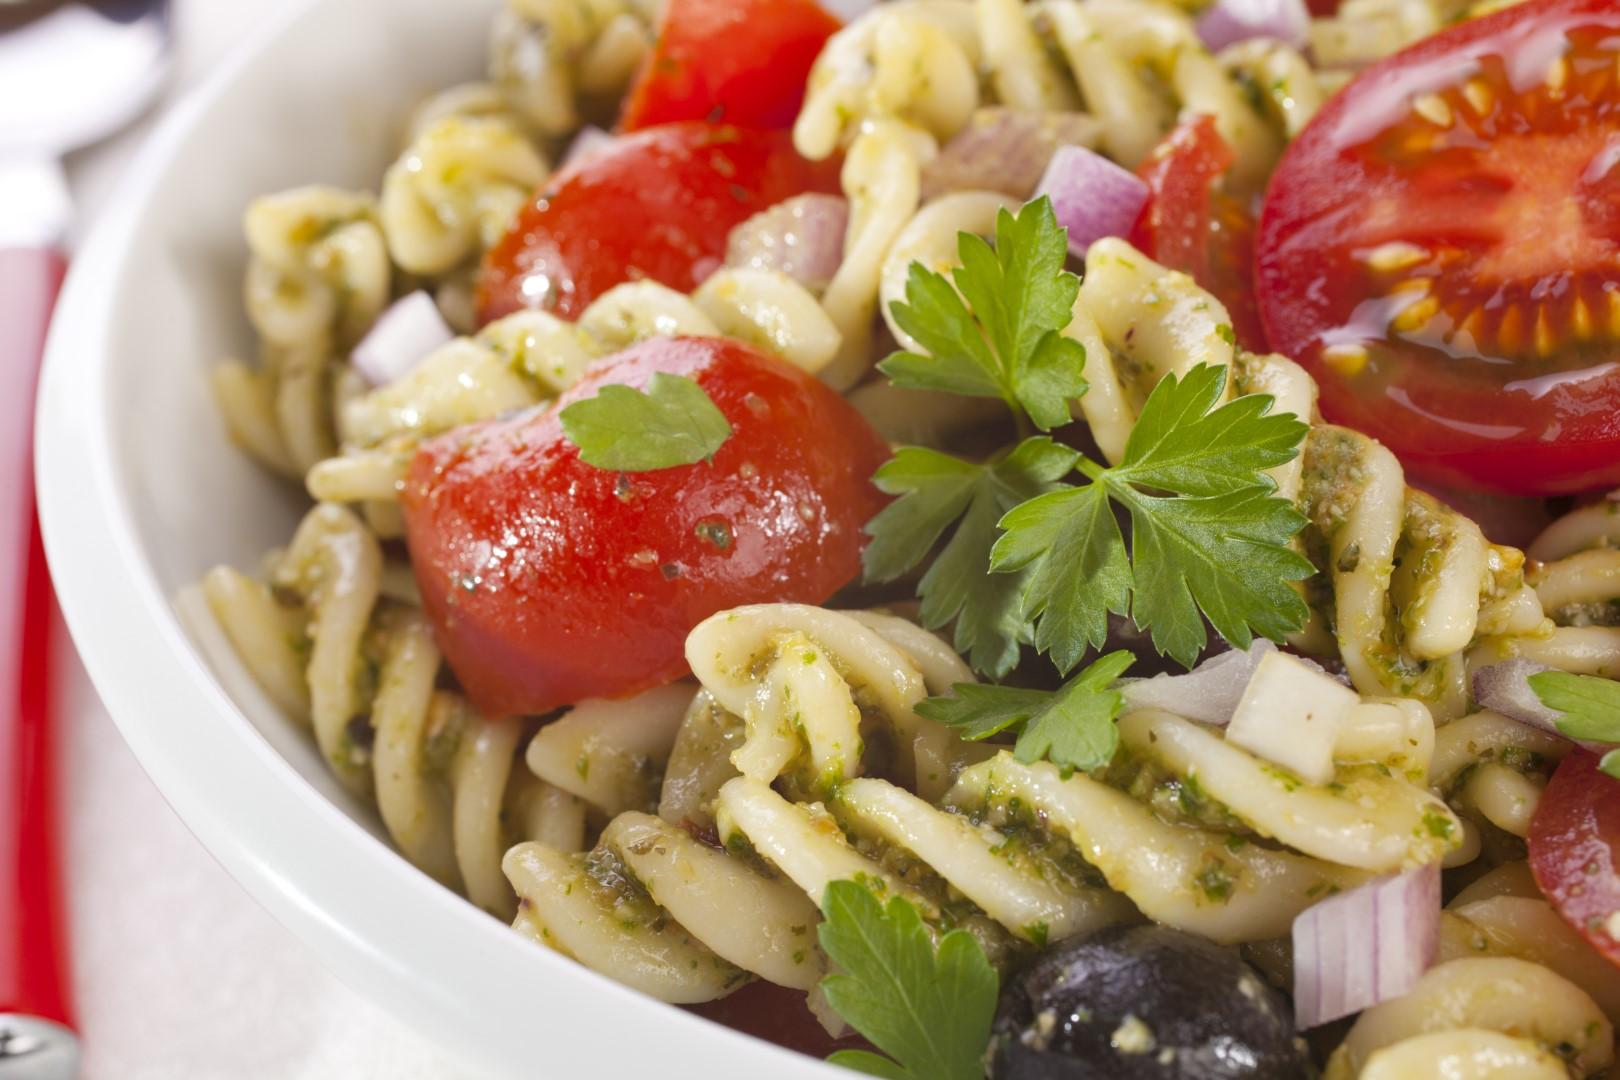 Pasta_fusili_salad_pesto_tomatoes_olives_onion